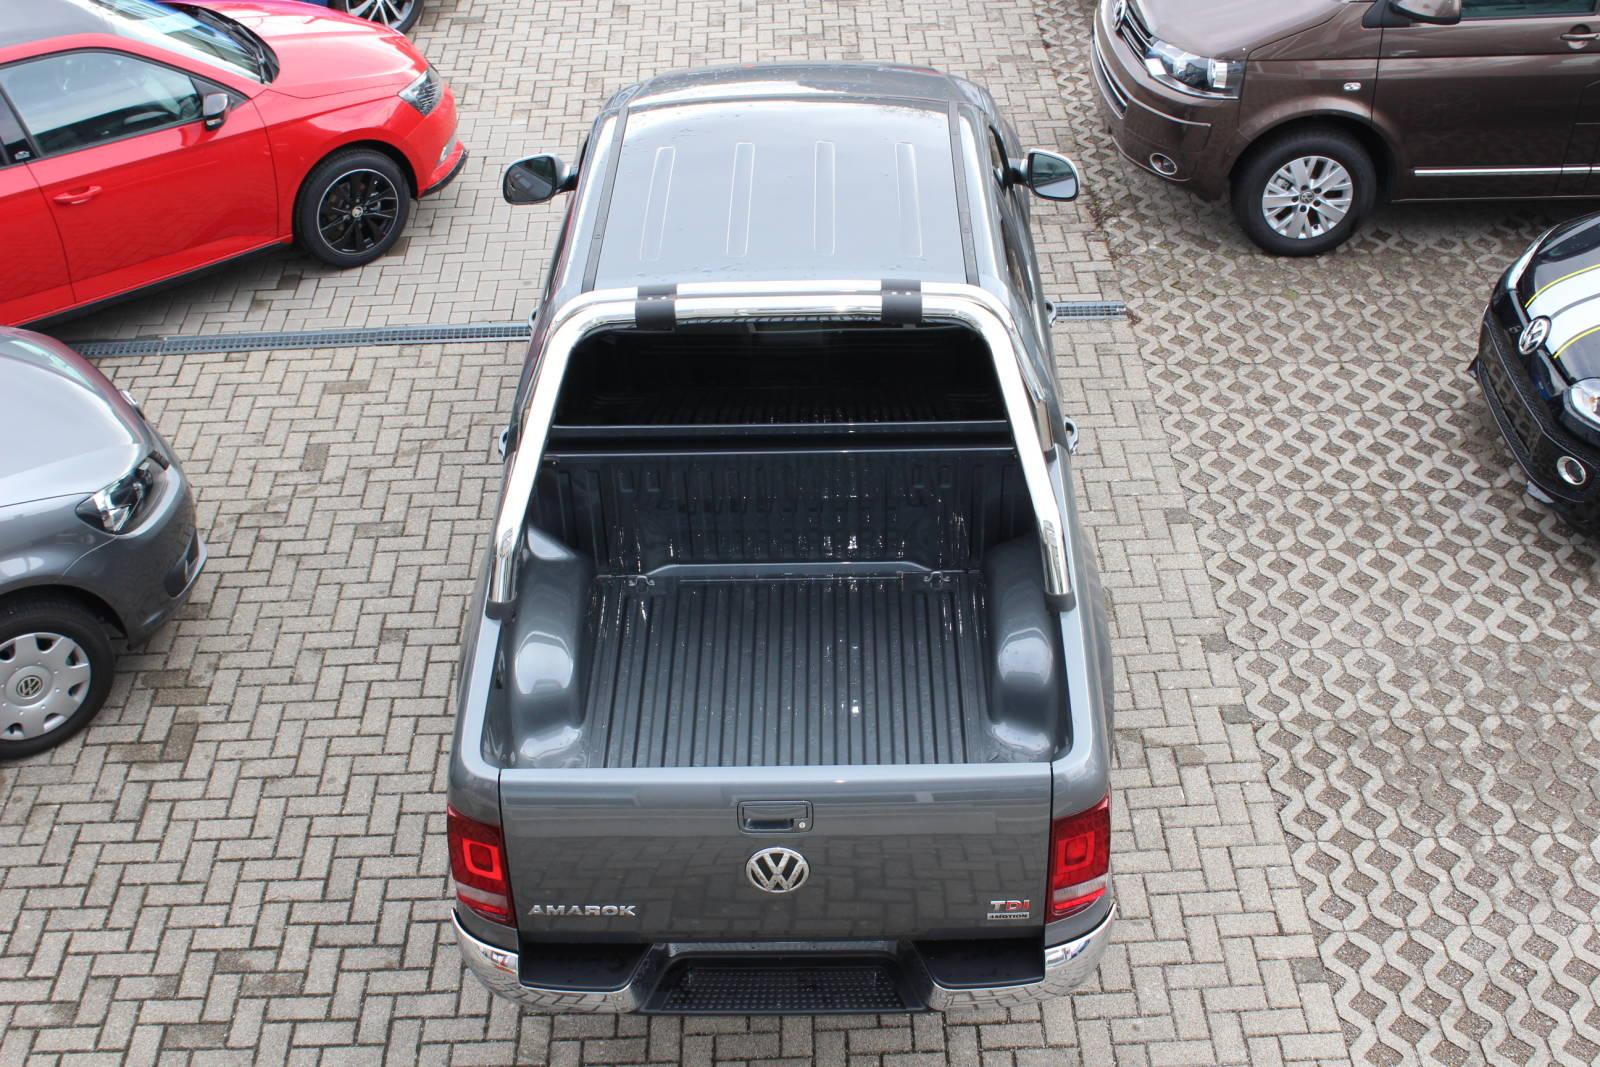 VW Amarok Ultimate 2.0 TDI 4Motion 8-Gang Automatik / Deutsche Neufahrzeuge und EU-Neufahrzeuge – Aha! Fahrzeughandel GmbH in Althengstett